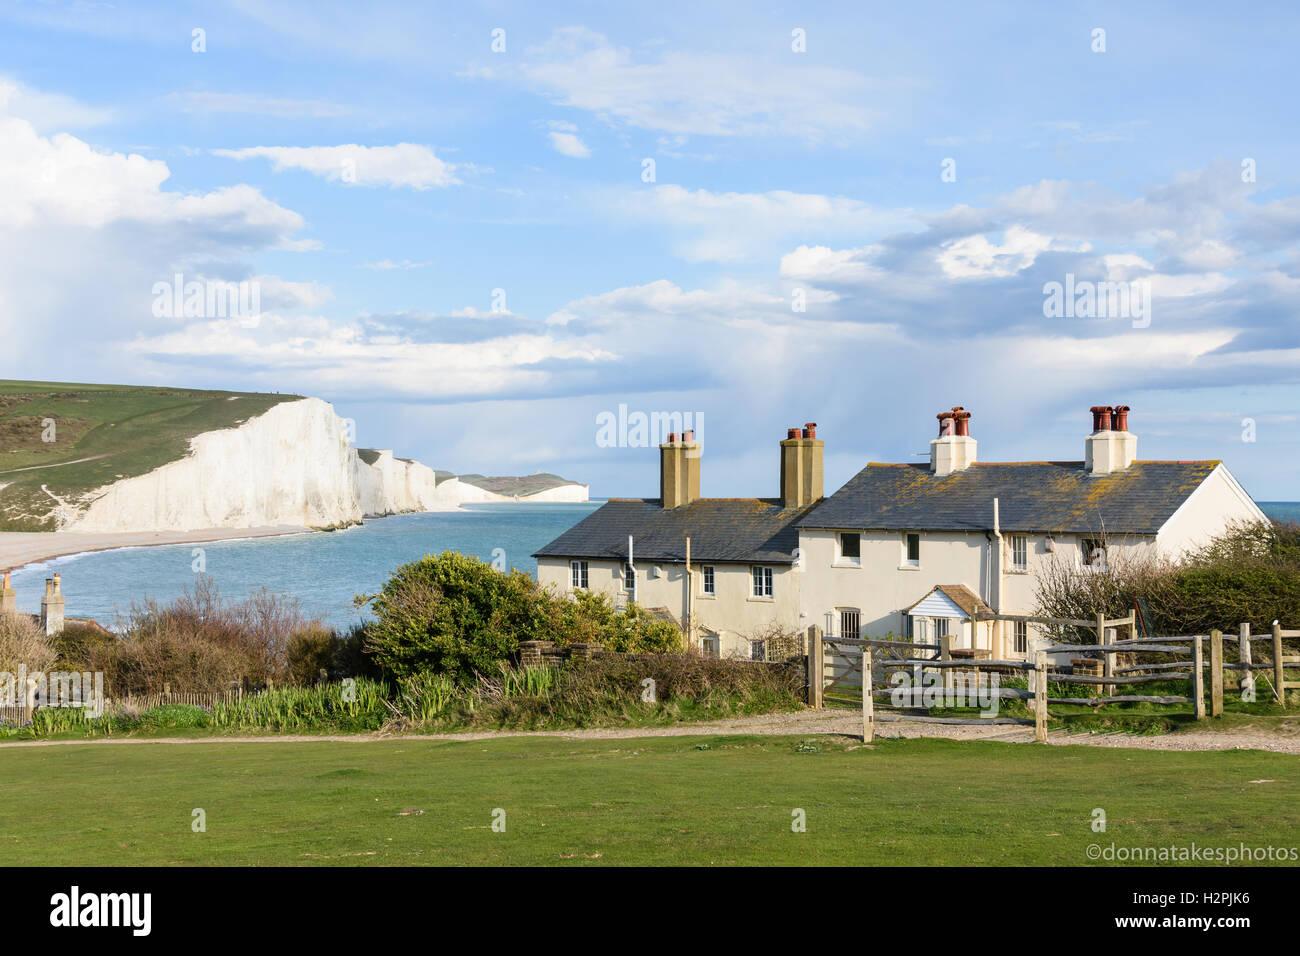 Coastguard cottages, Cuckmere Haven, East Sussex, England, UK Stock Photo